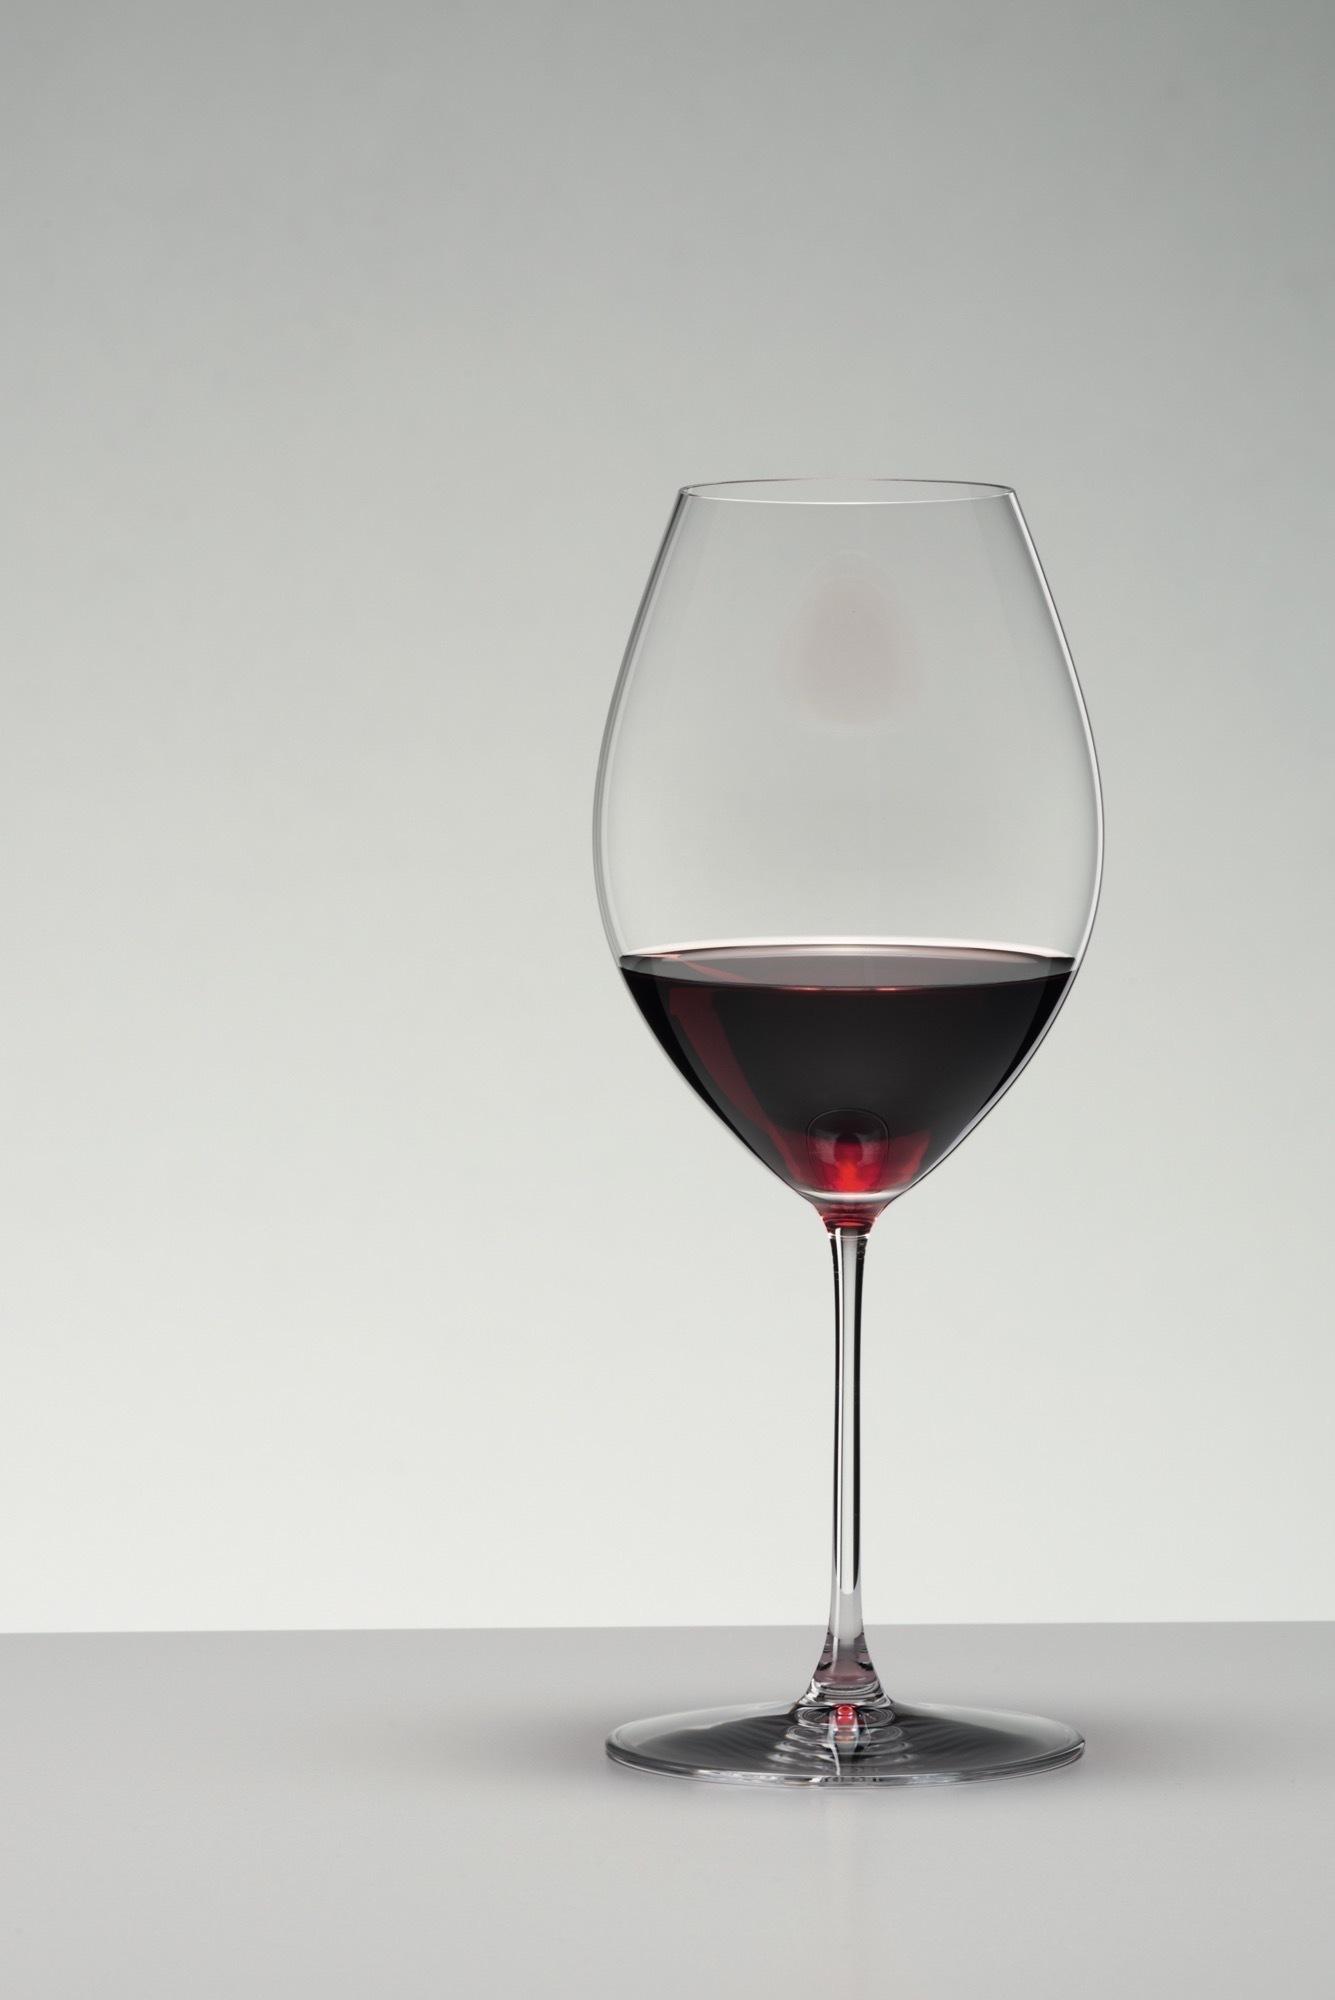 Набор из 2-х бокалов для вина Riedel Old World Syrah, Riedel Veritas, 600 мл riedel набор бокалов для красного вина pinot nebbiolo 690 мл 2 шт 0414 07 riedel